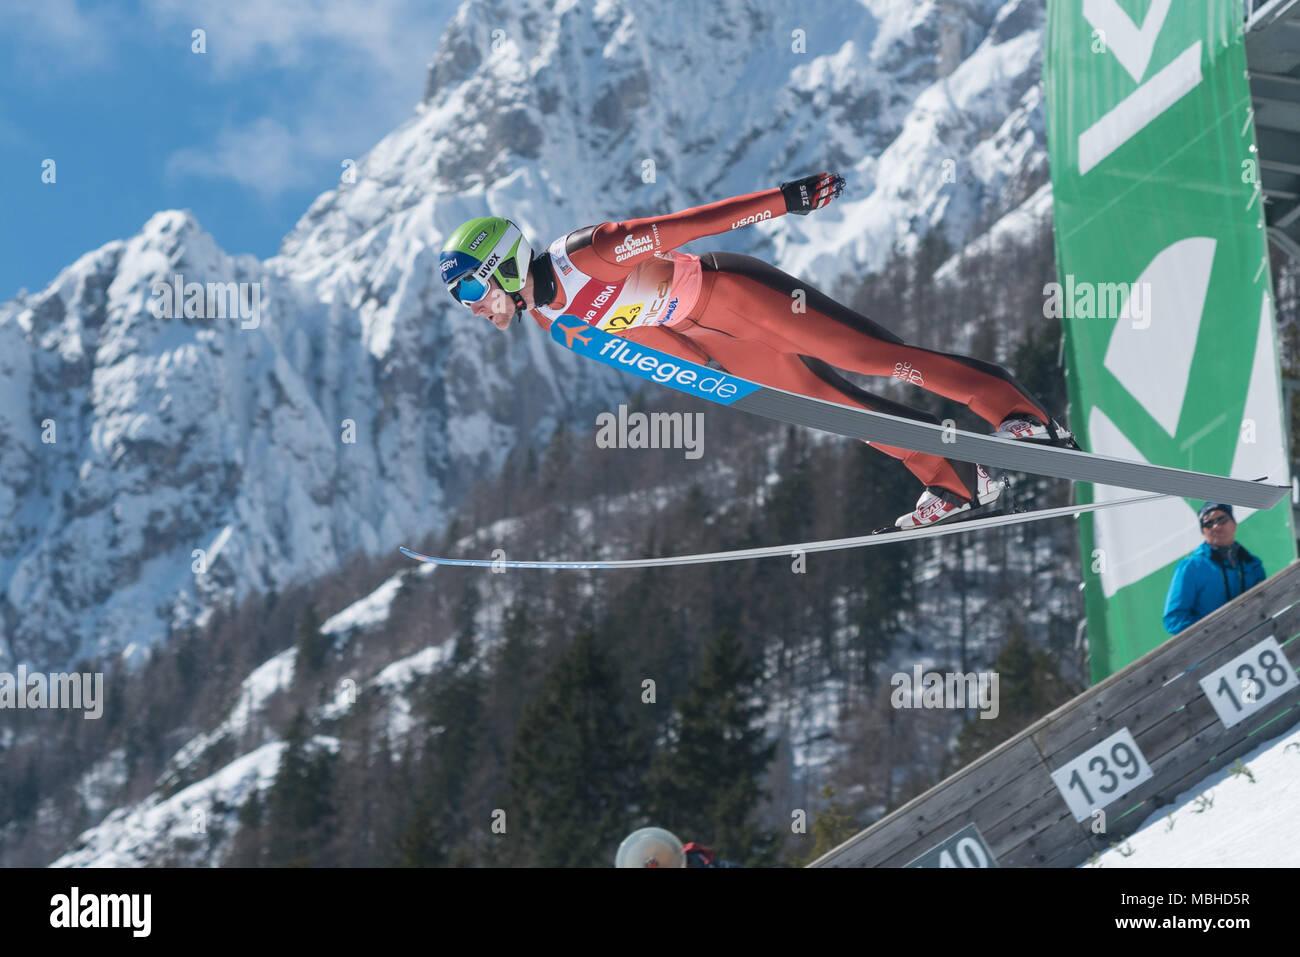 PLANICA, SLOVENIA - MARCH 24 2018 : Fis World Cup Ski Jumping Final - GLASDER Michael USA - Stock Image